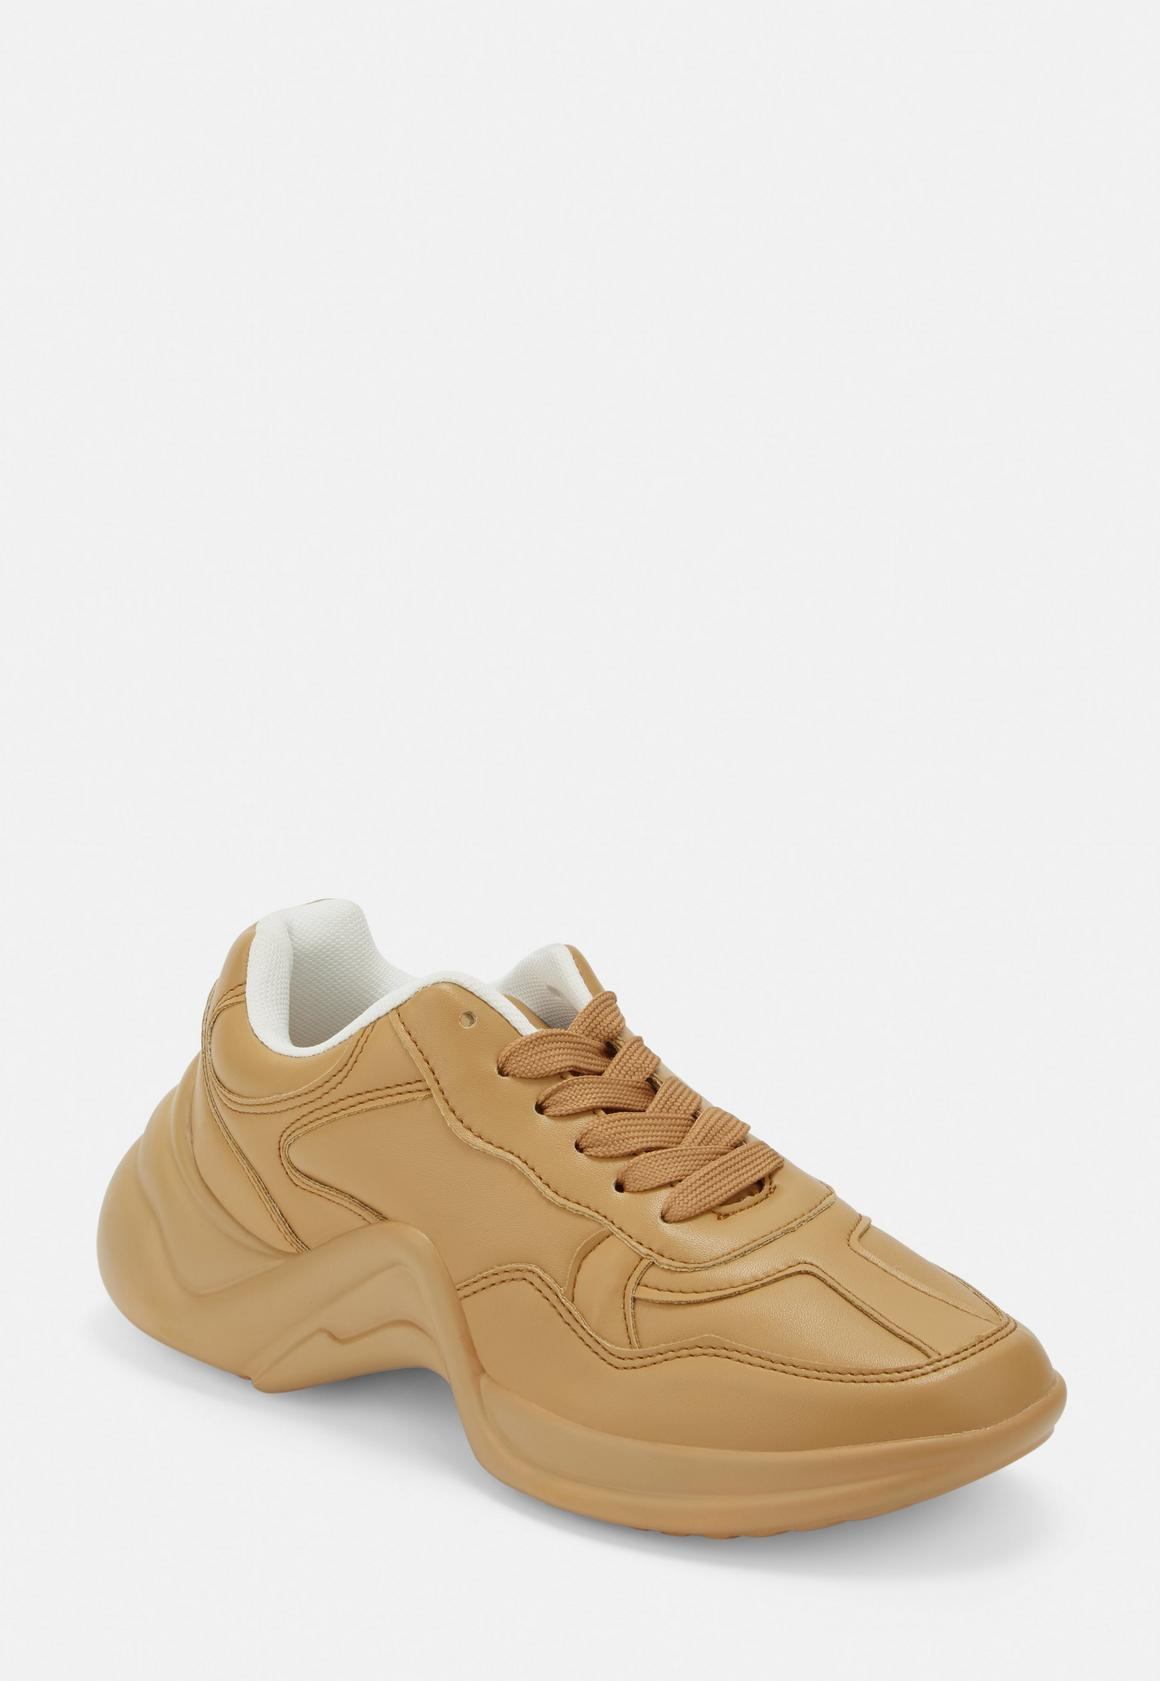 camel-chunky-sole-sneakers.jpg